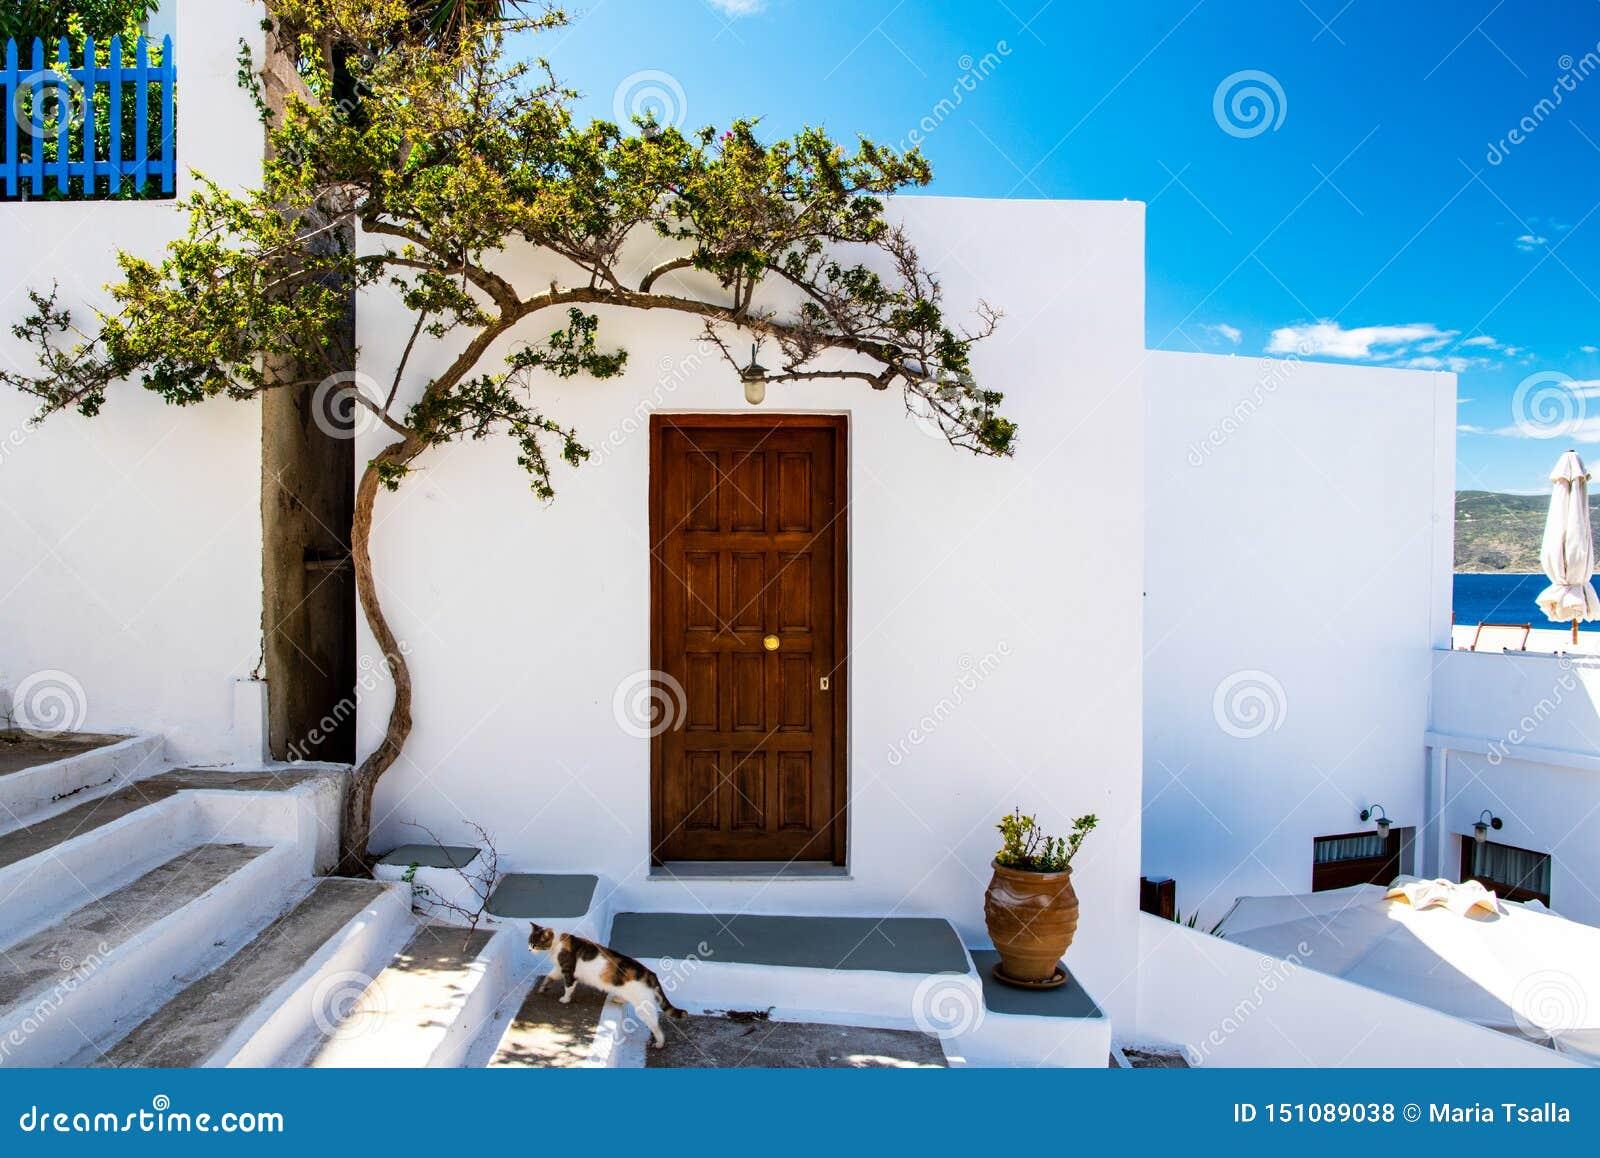 A traditional Cycladic architecture in Adamas, Milos.